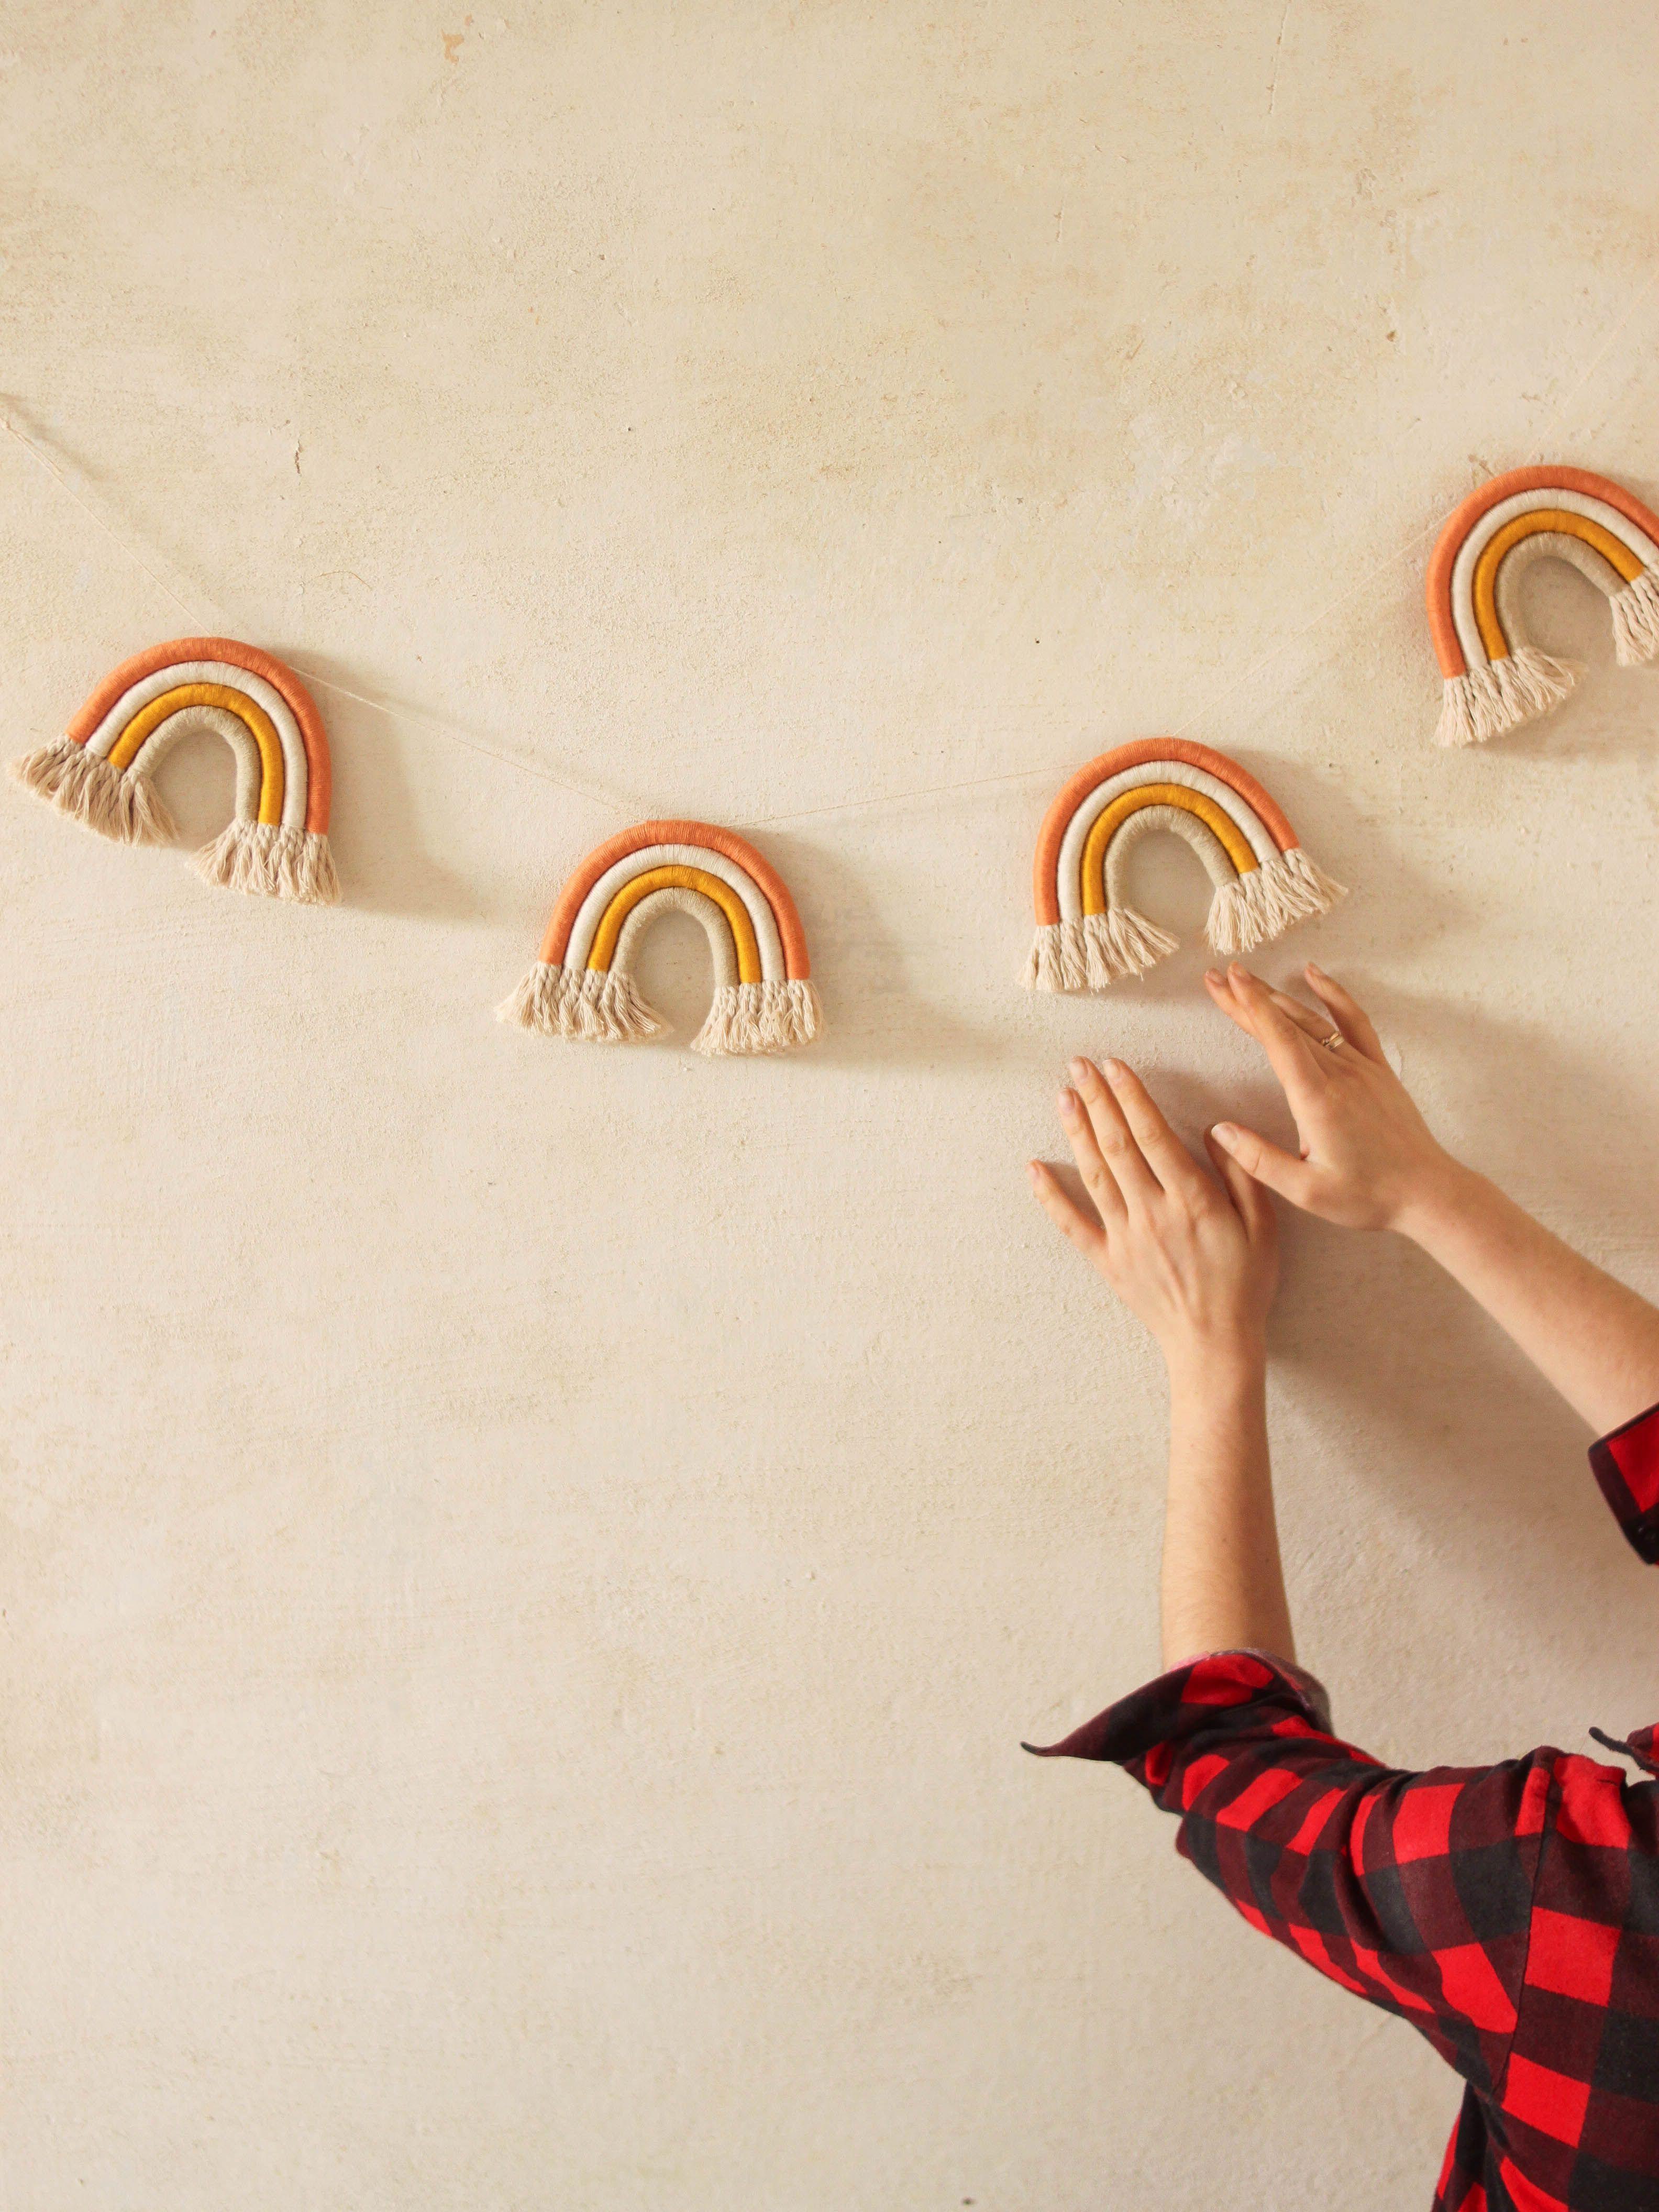 Terracotta Macrame Rainbow Garland Wall Hanging Fiber Rainbow Nursery Wall Decor In 2020 Nursery Wall Decor Diy Baby Stuff Diy Crafts To Sell